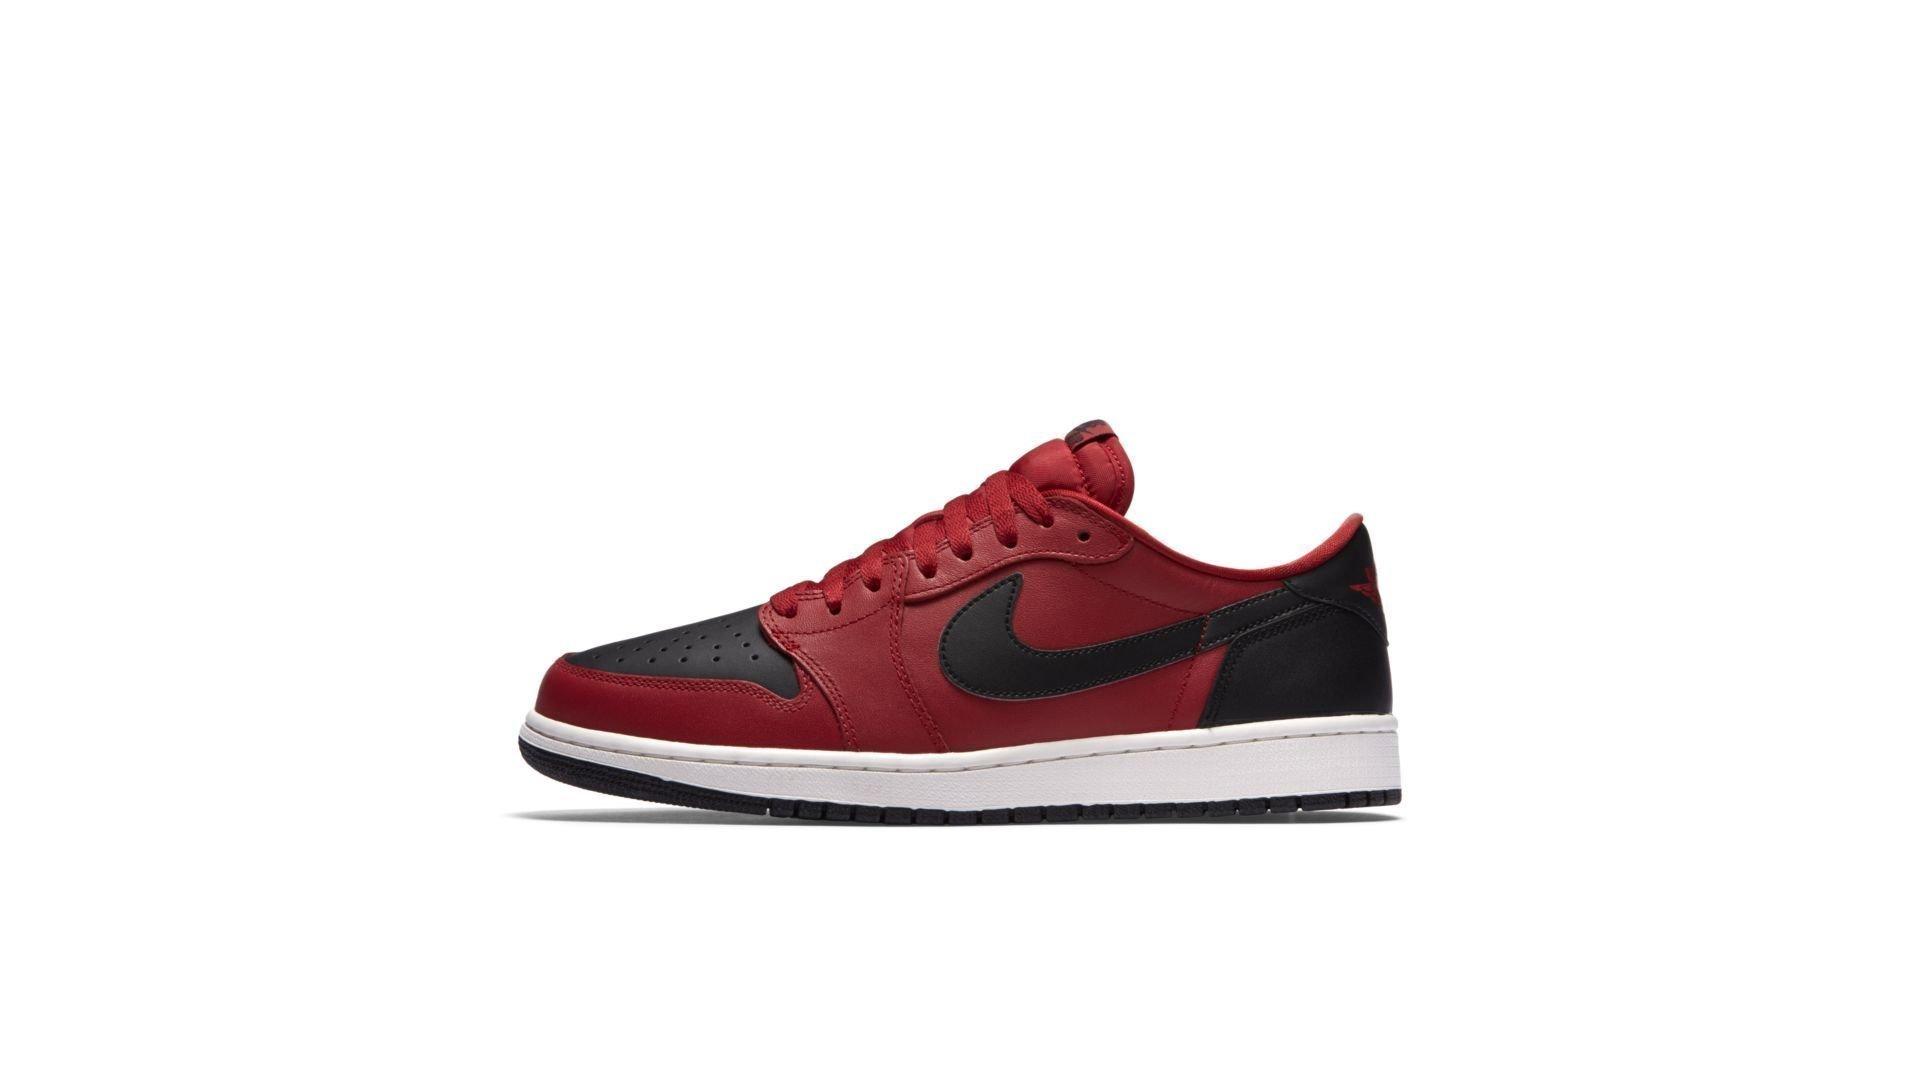 Jordan 1 Retro Low Gym Red Black (705329-601)